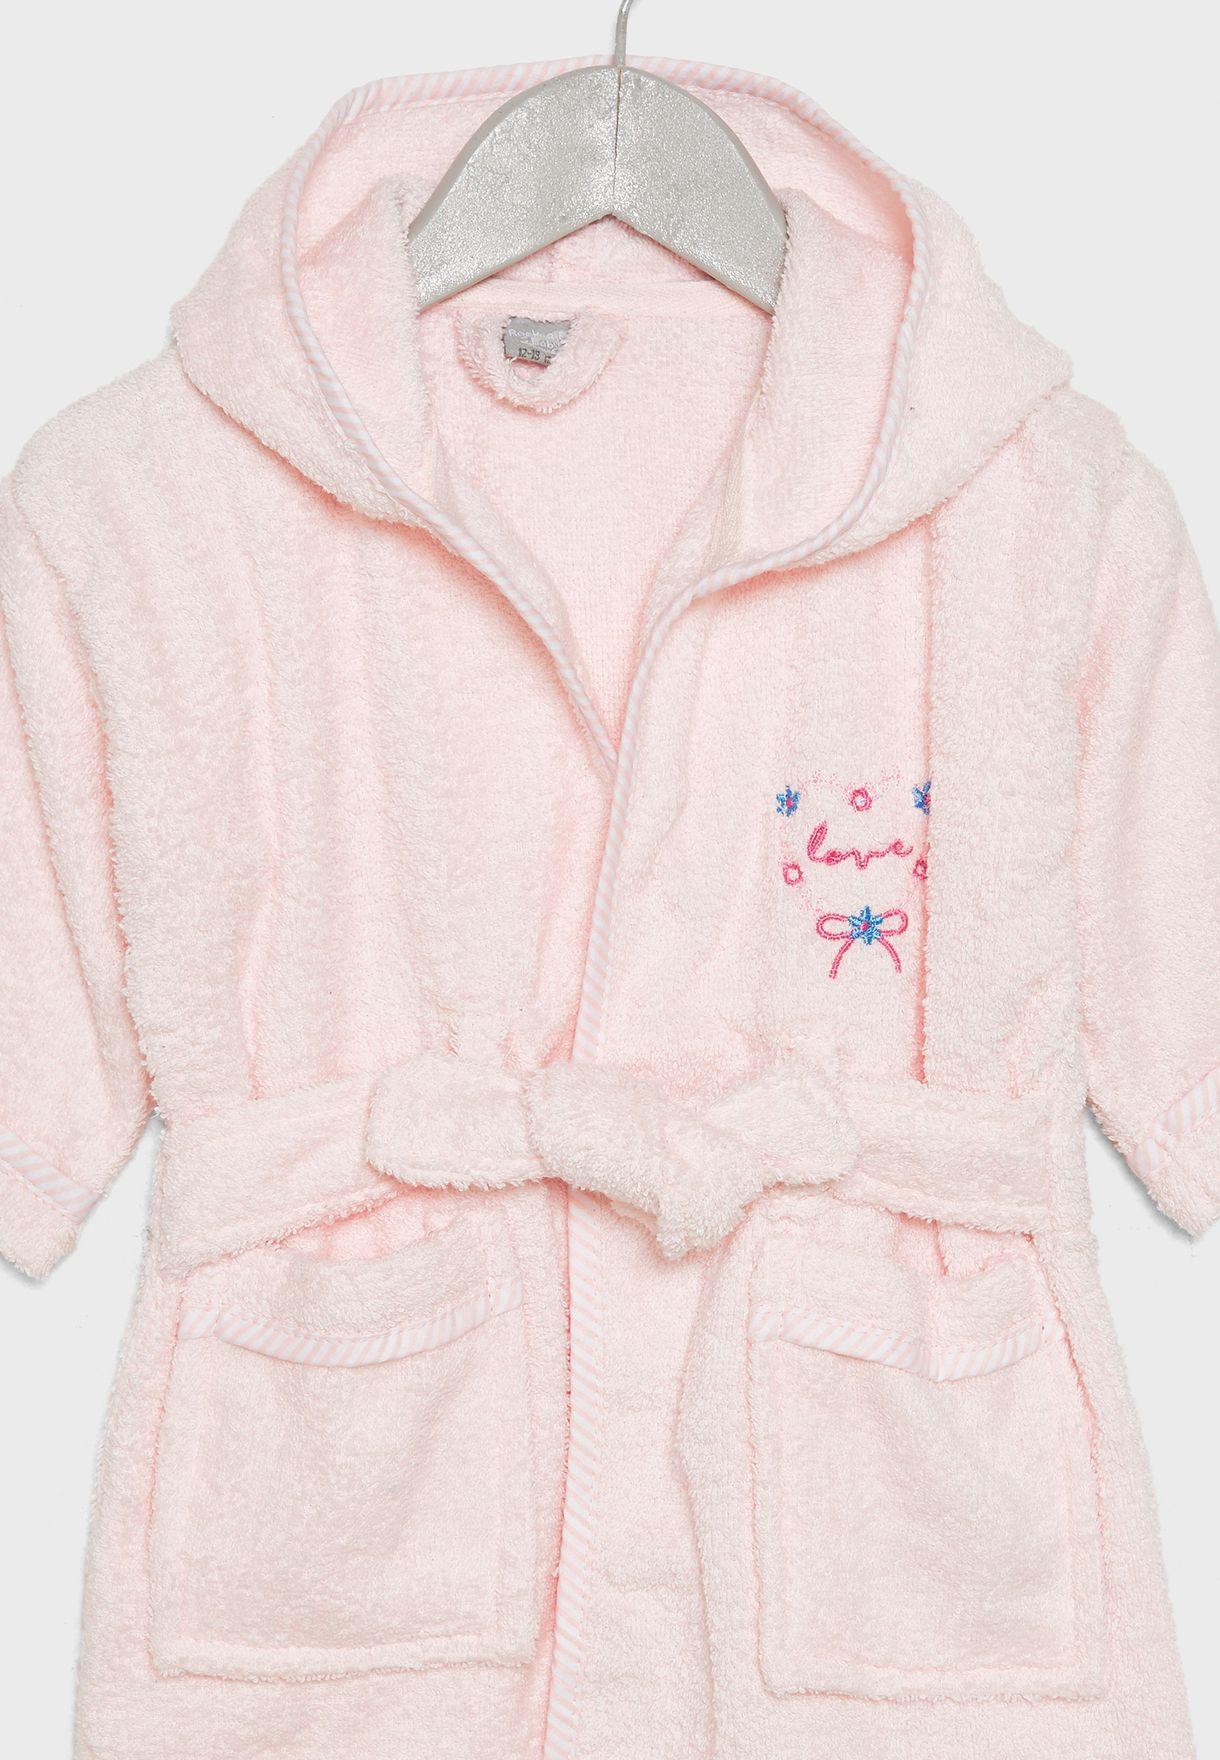 Infant Heart Embroidered Bathrobe